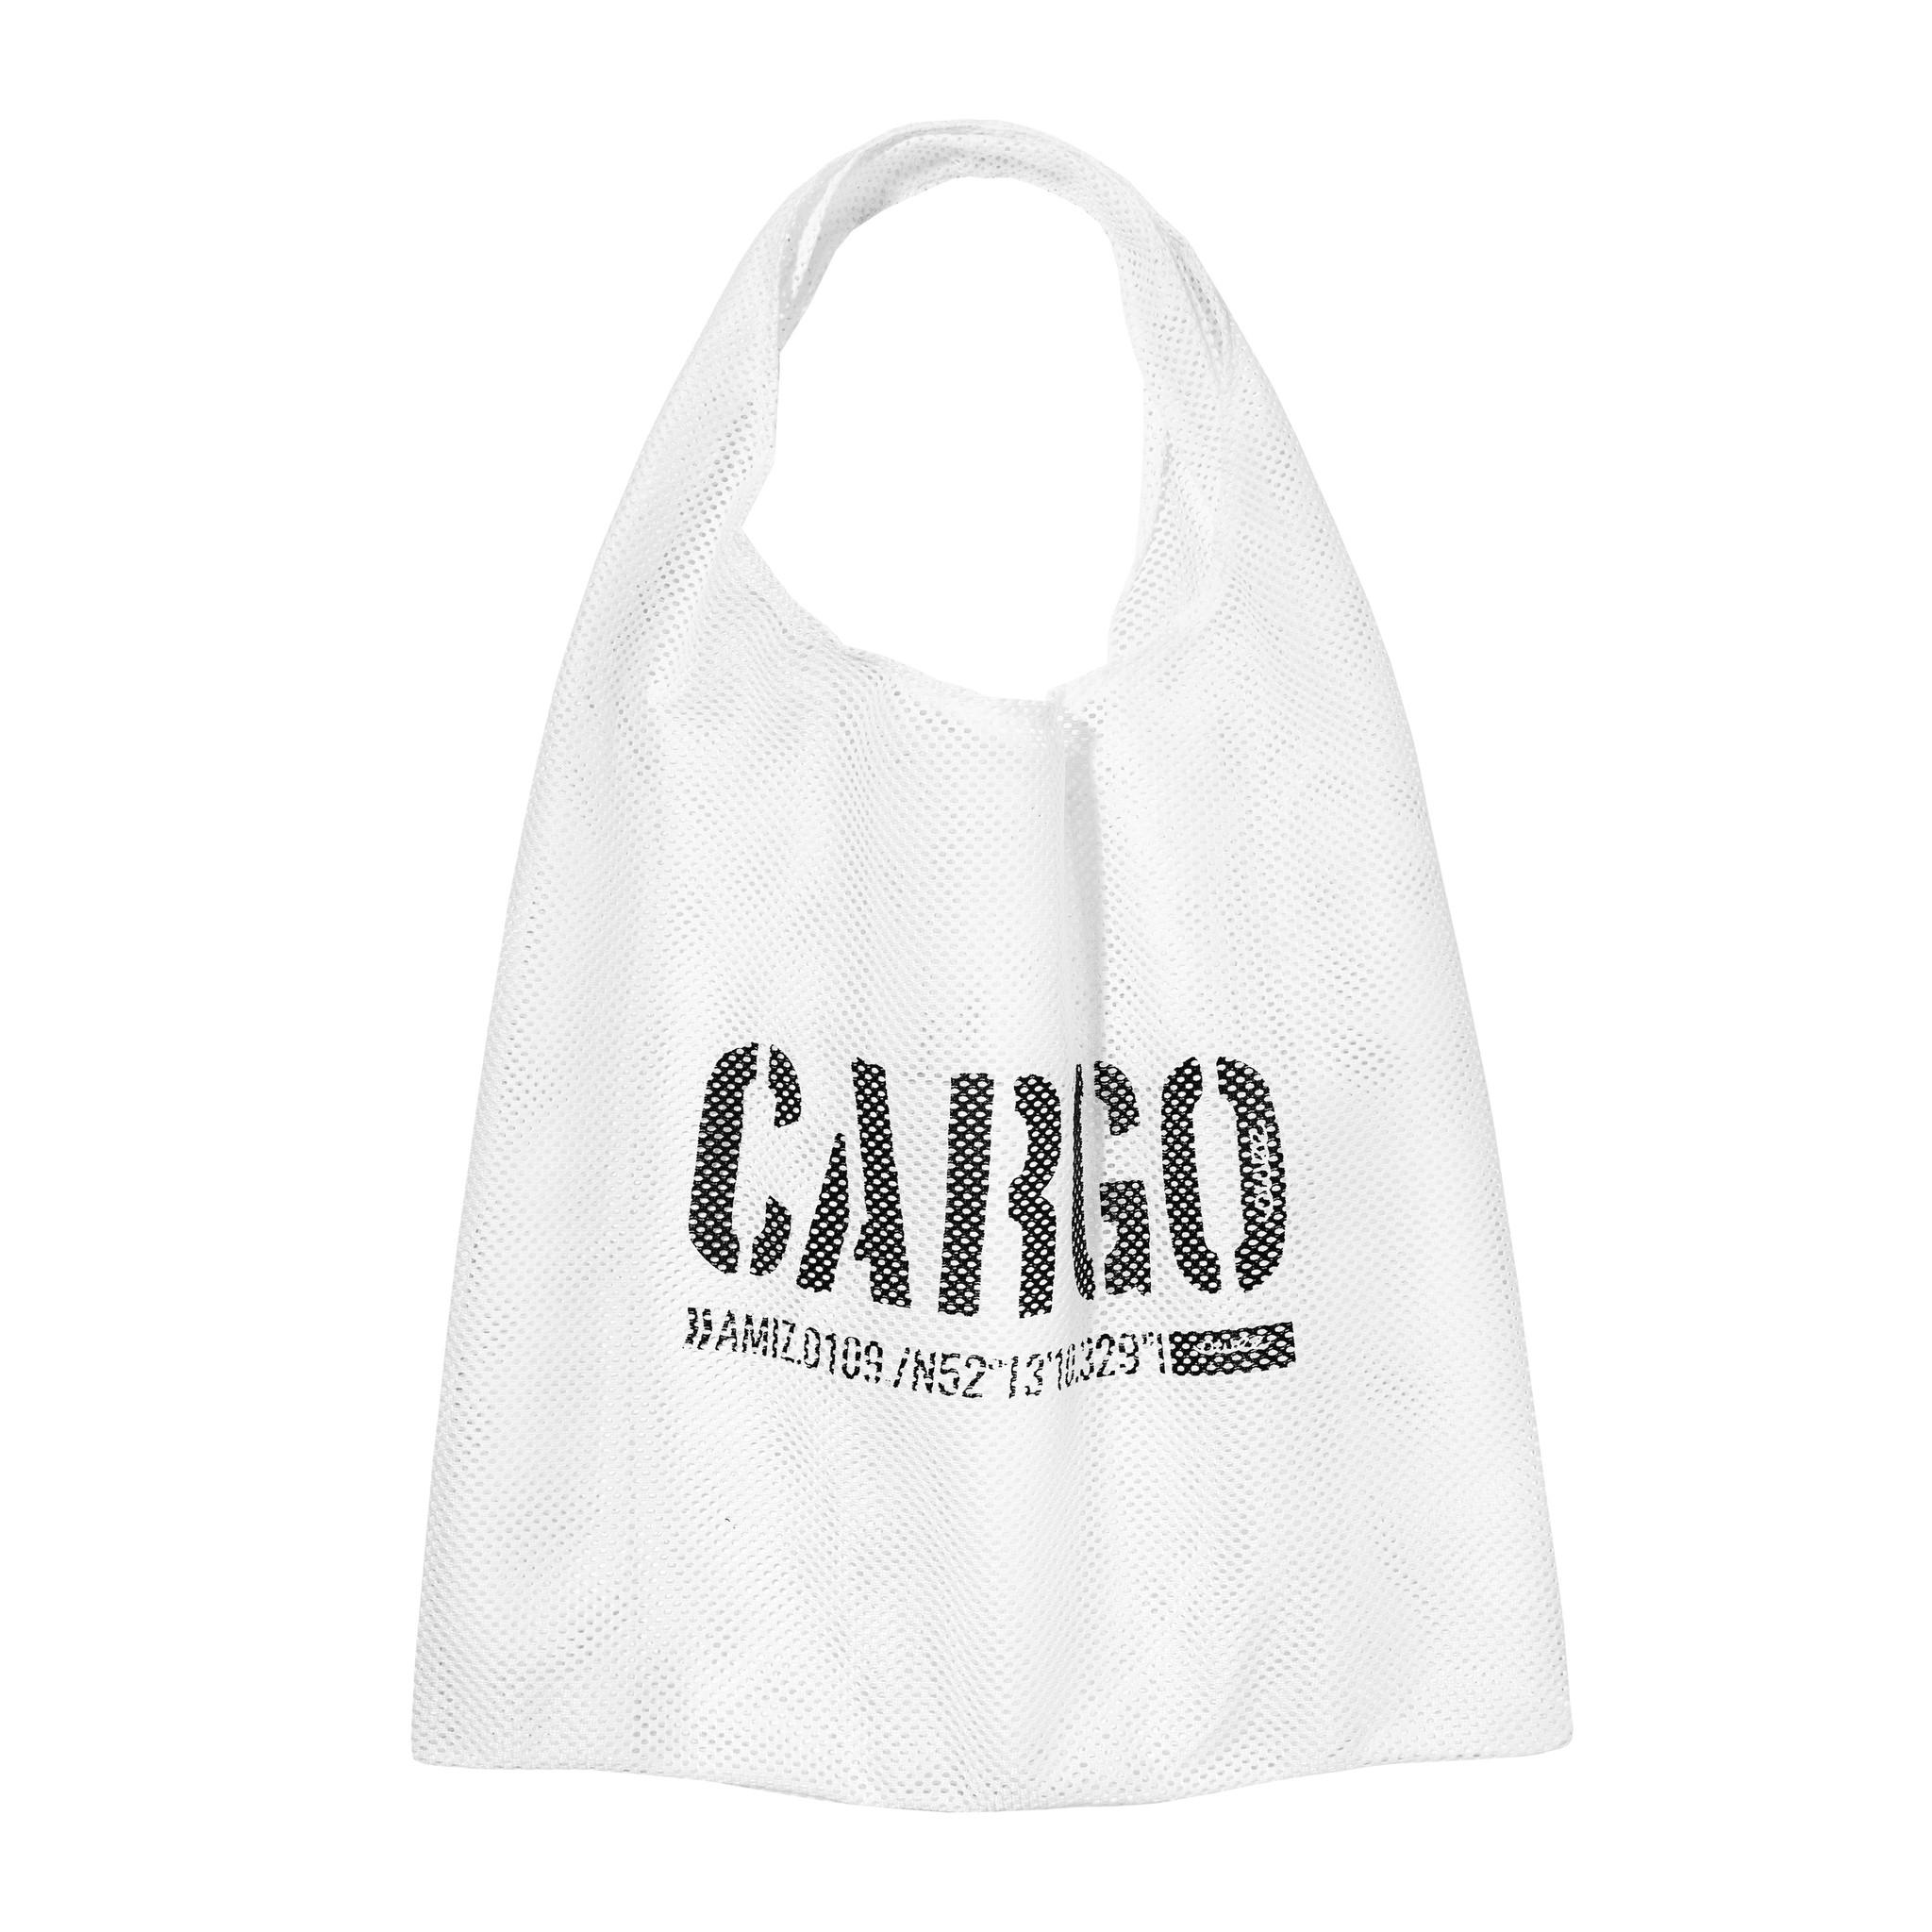 Torba Shopper White Mesh - CARGO by OWEE